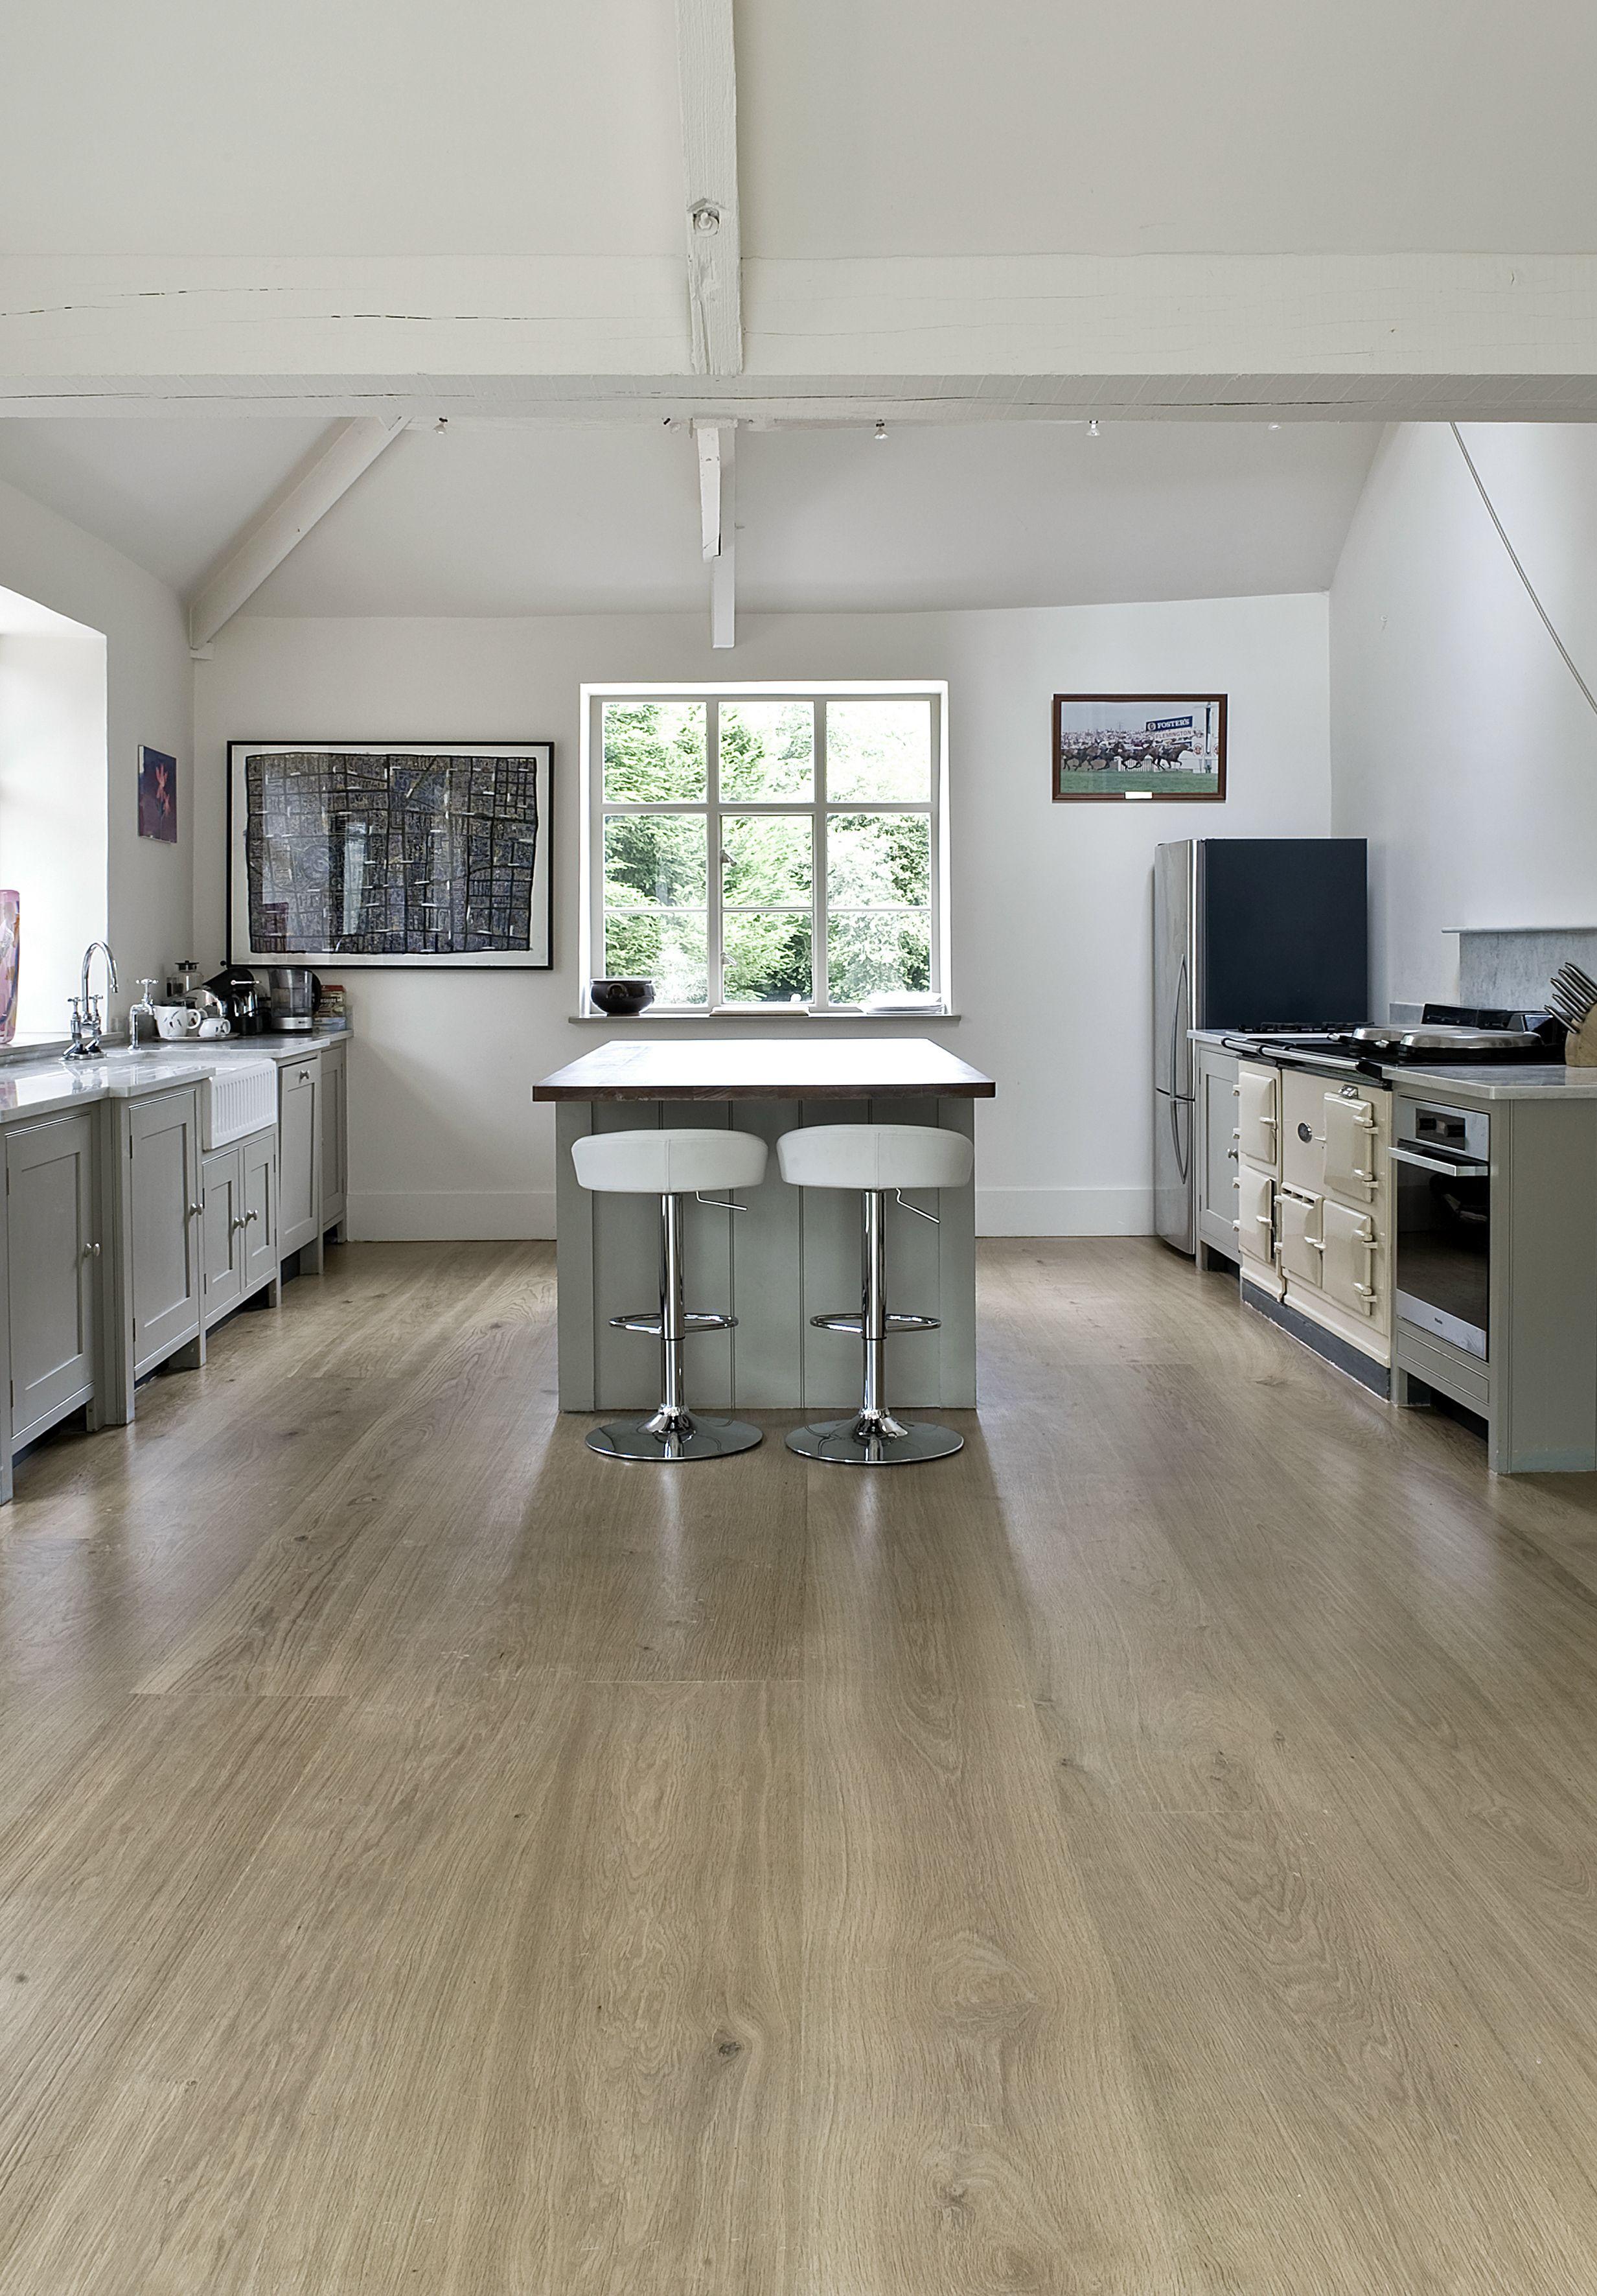 oak parquet grandoak by dinesen. Black Bedroom Furniture Sets. Home Design Ideas